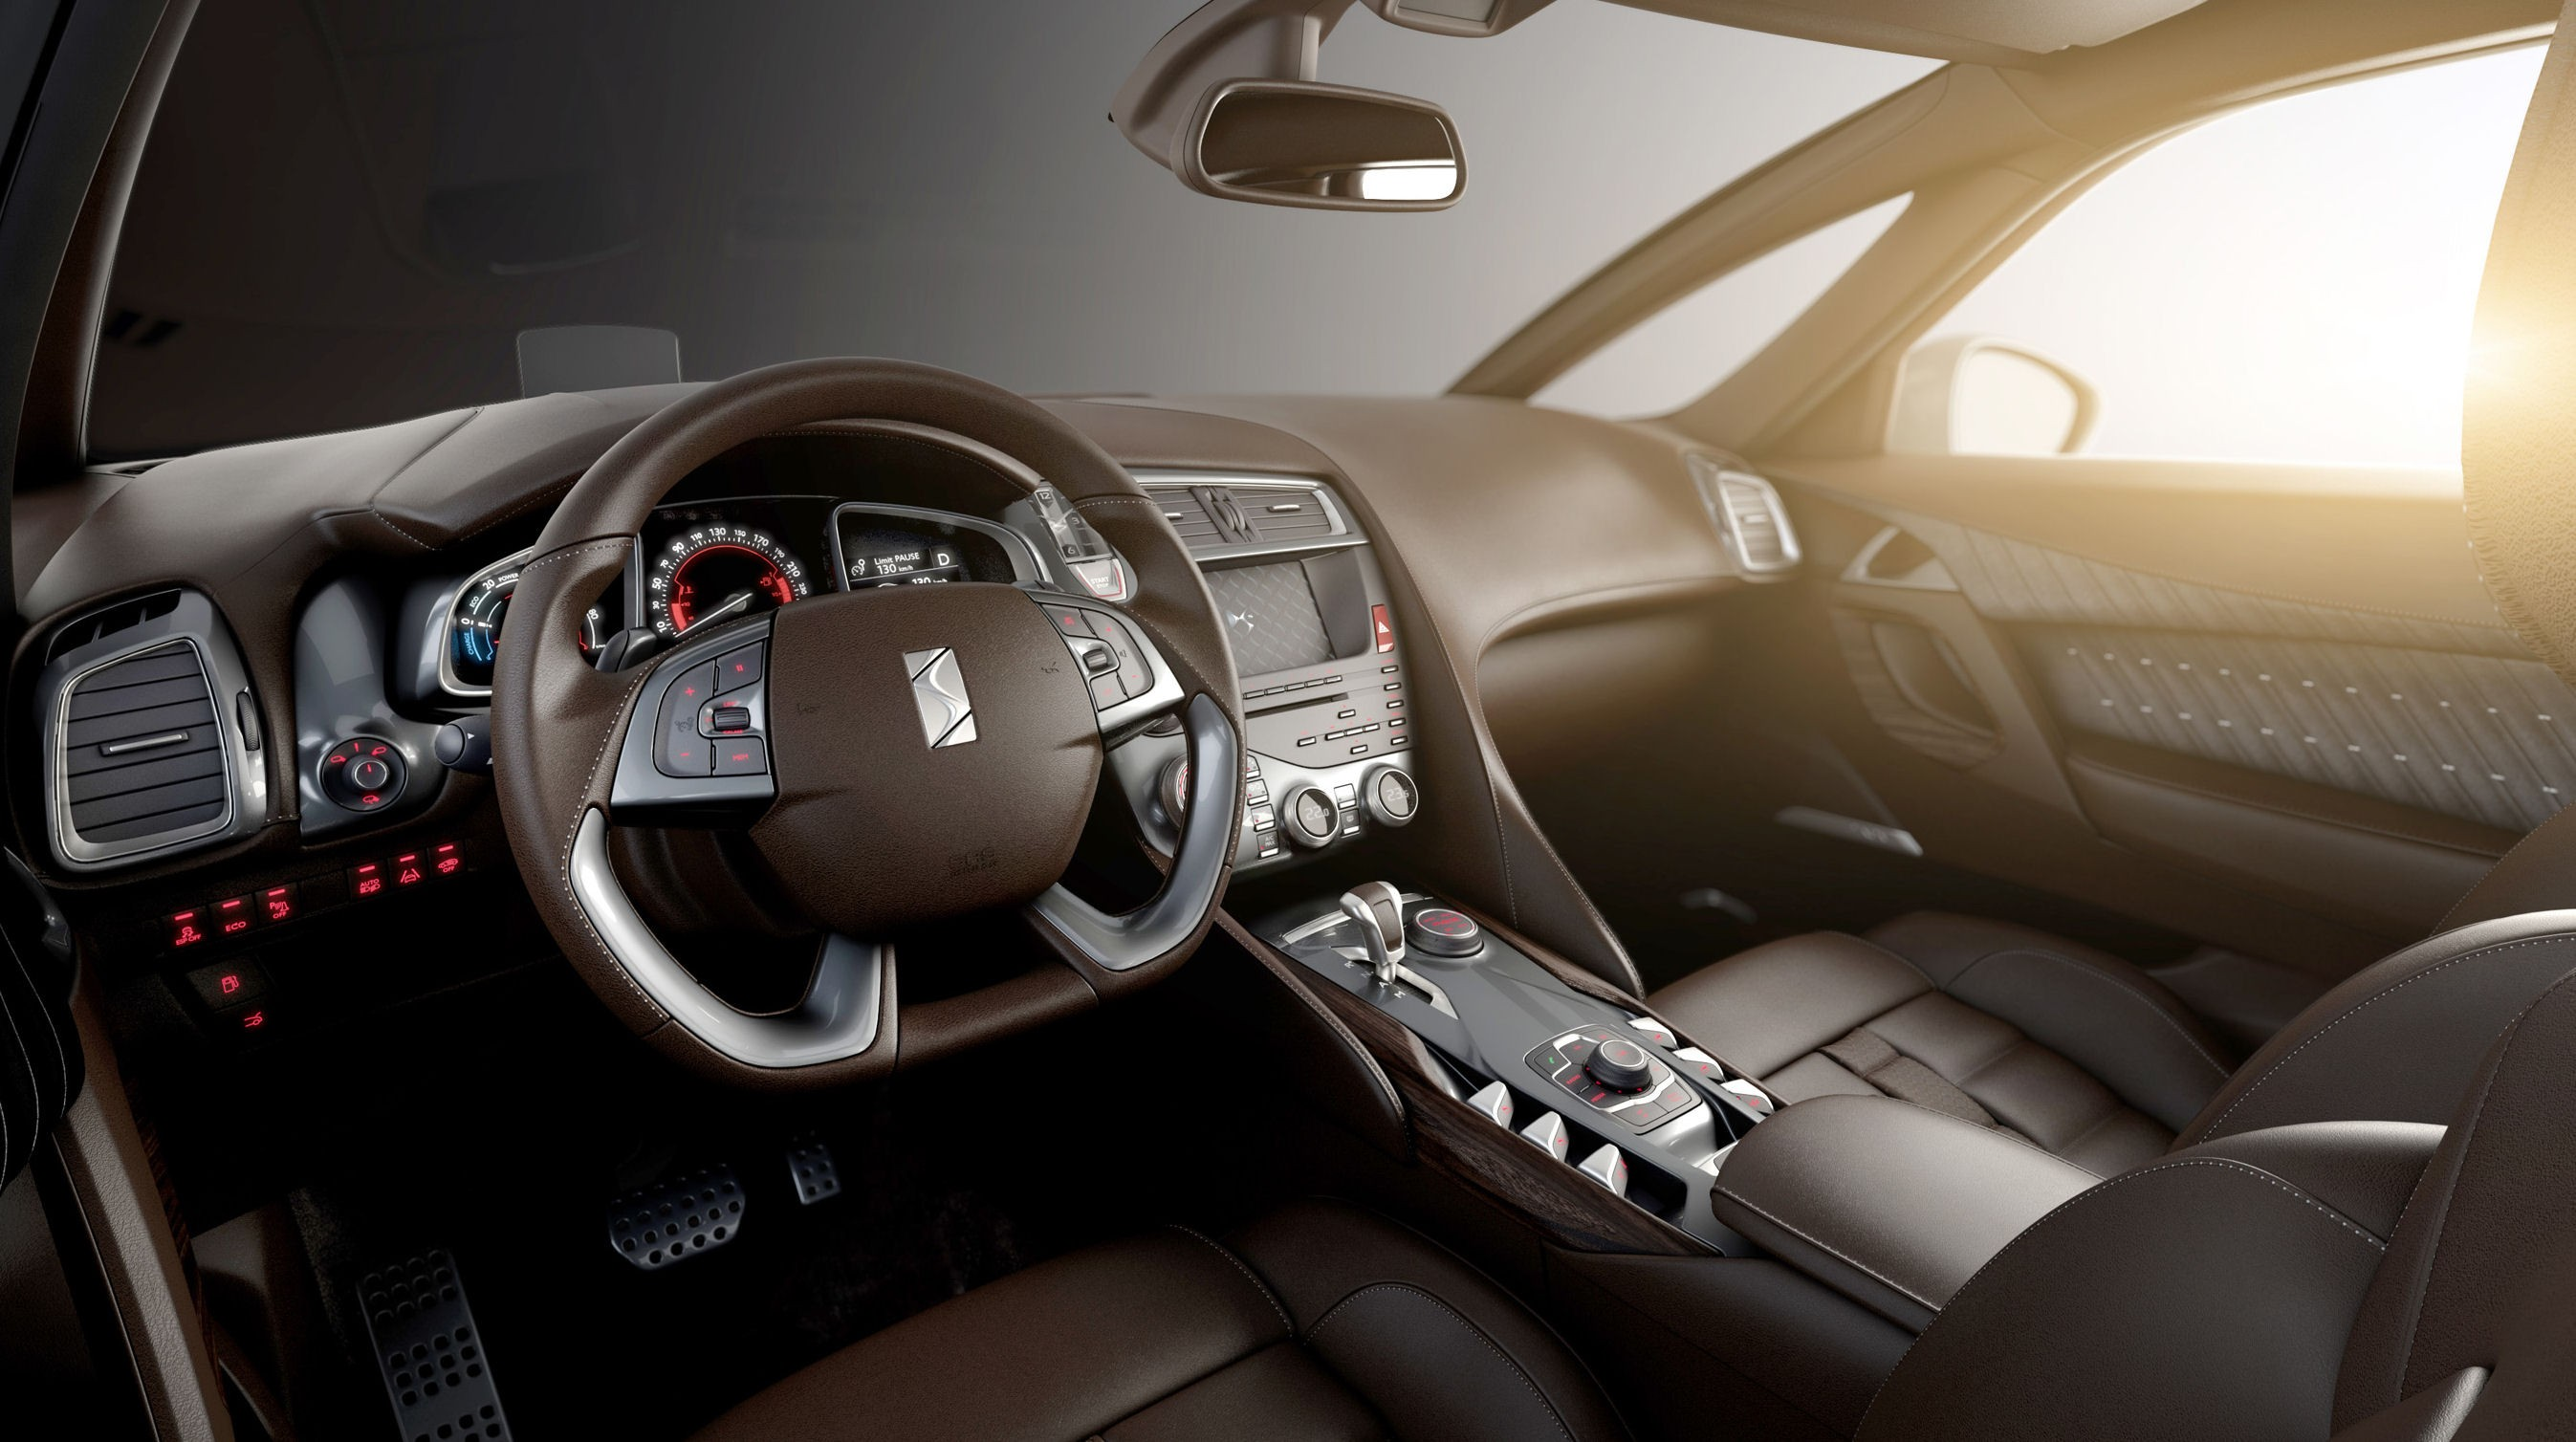 Hybrid Car Diagram Ds5 Hybrid 4 Car Reviews 2018 Of Hybrid Car Diagram